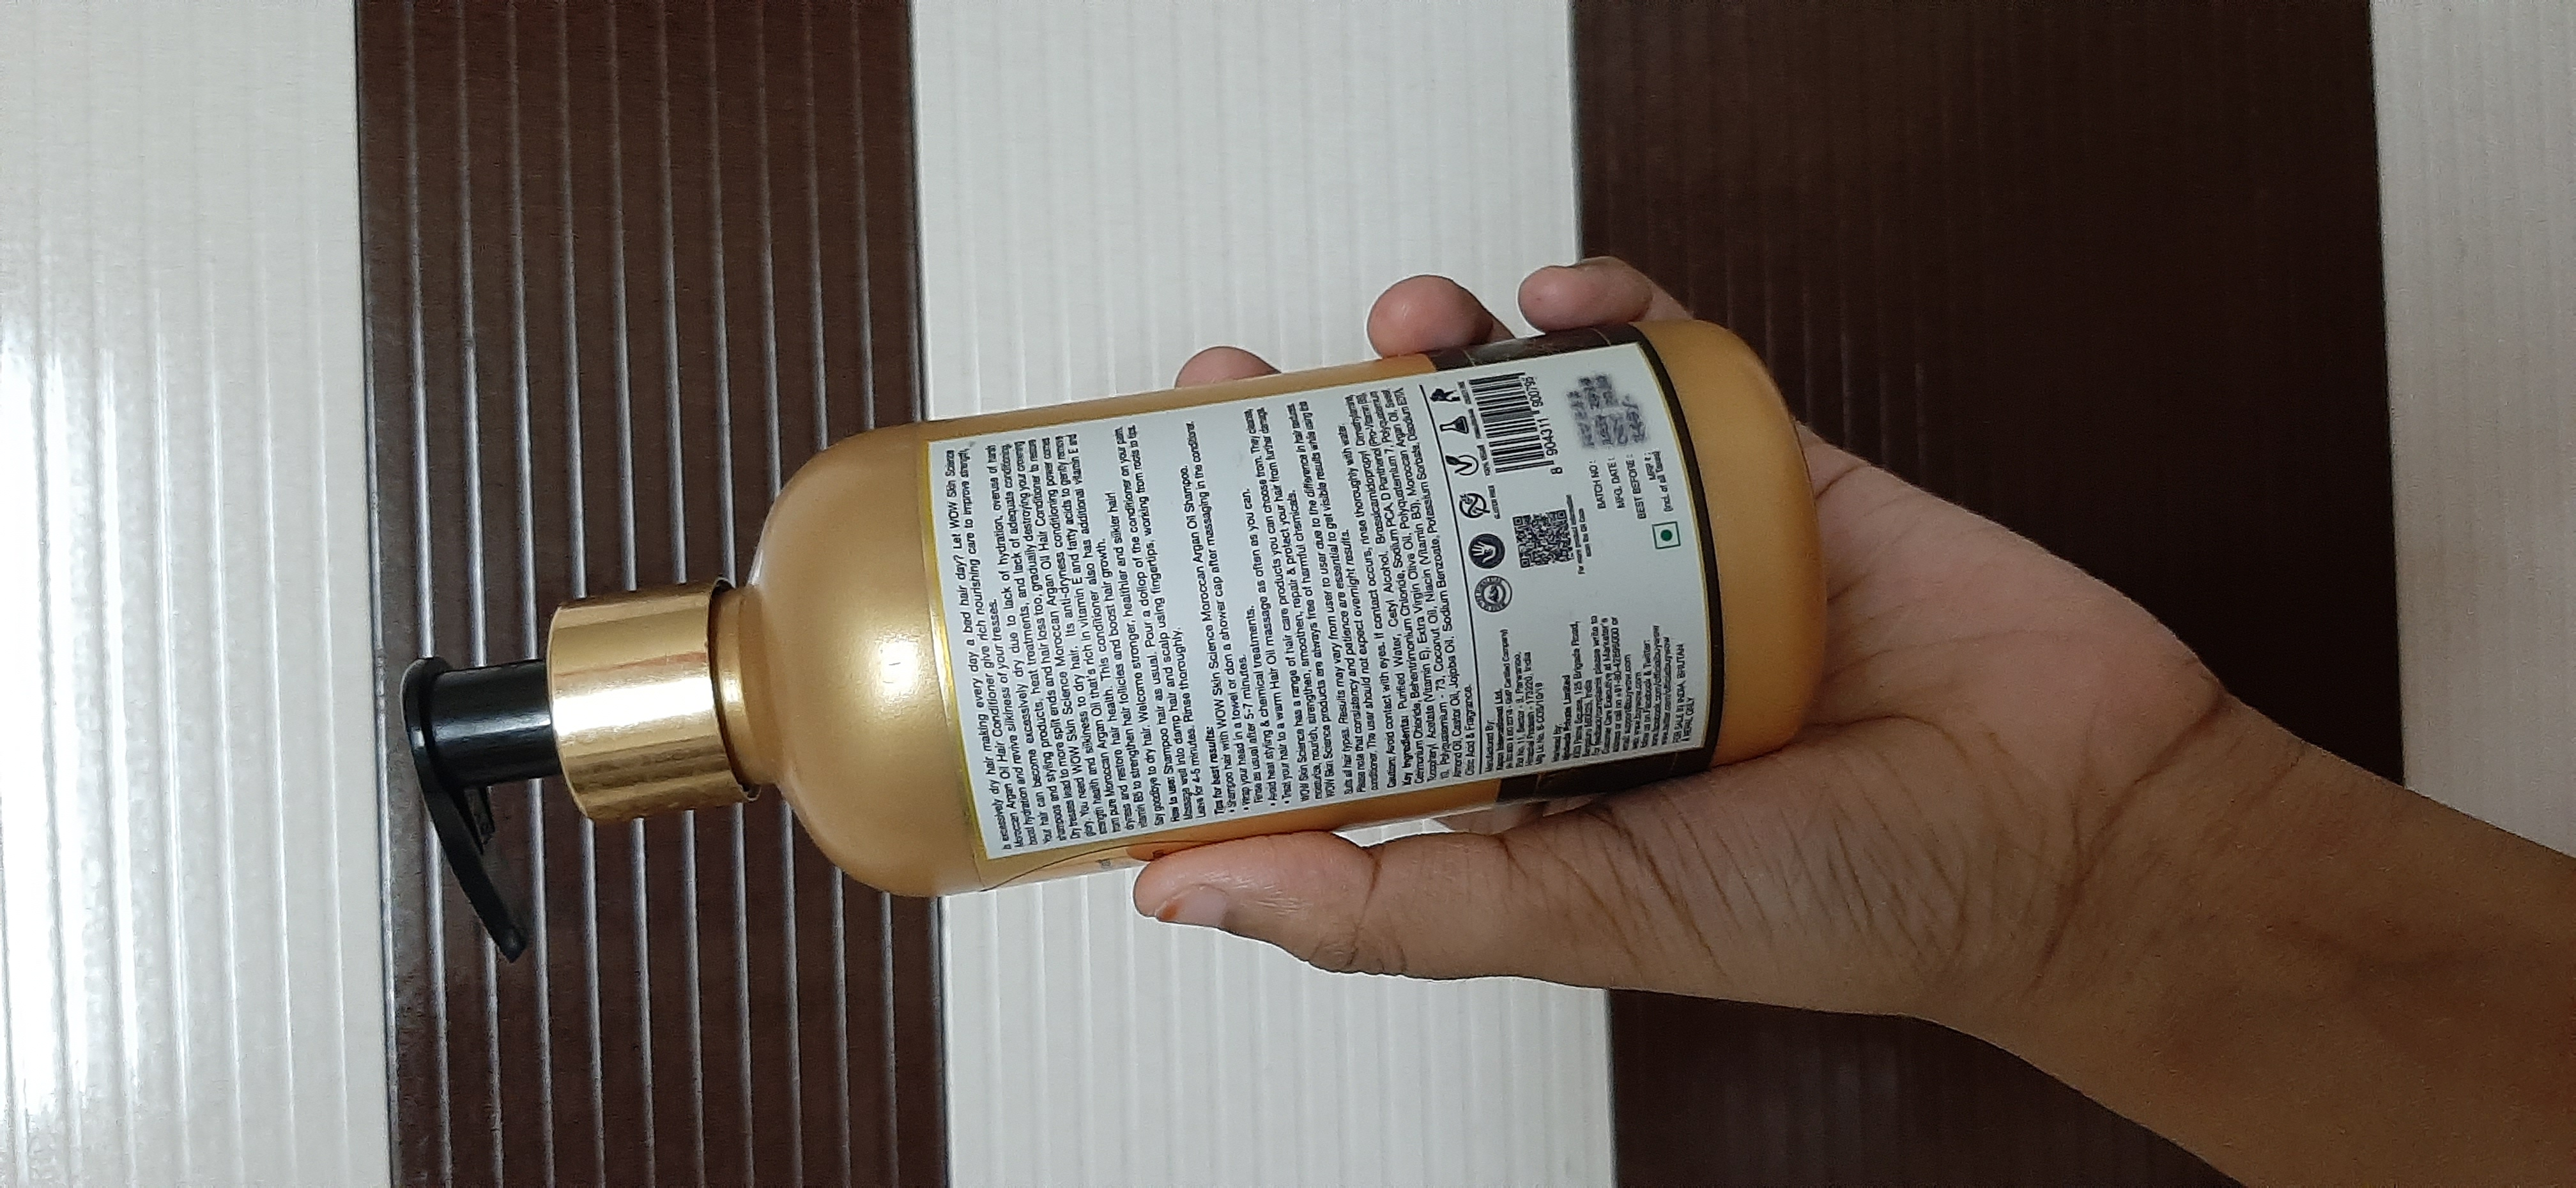 WOW Skin Science Moroccan Argan Oil Conditioner-Wow moroccan Argan oil conditioner-By samira_haider-2